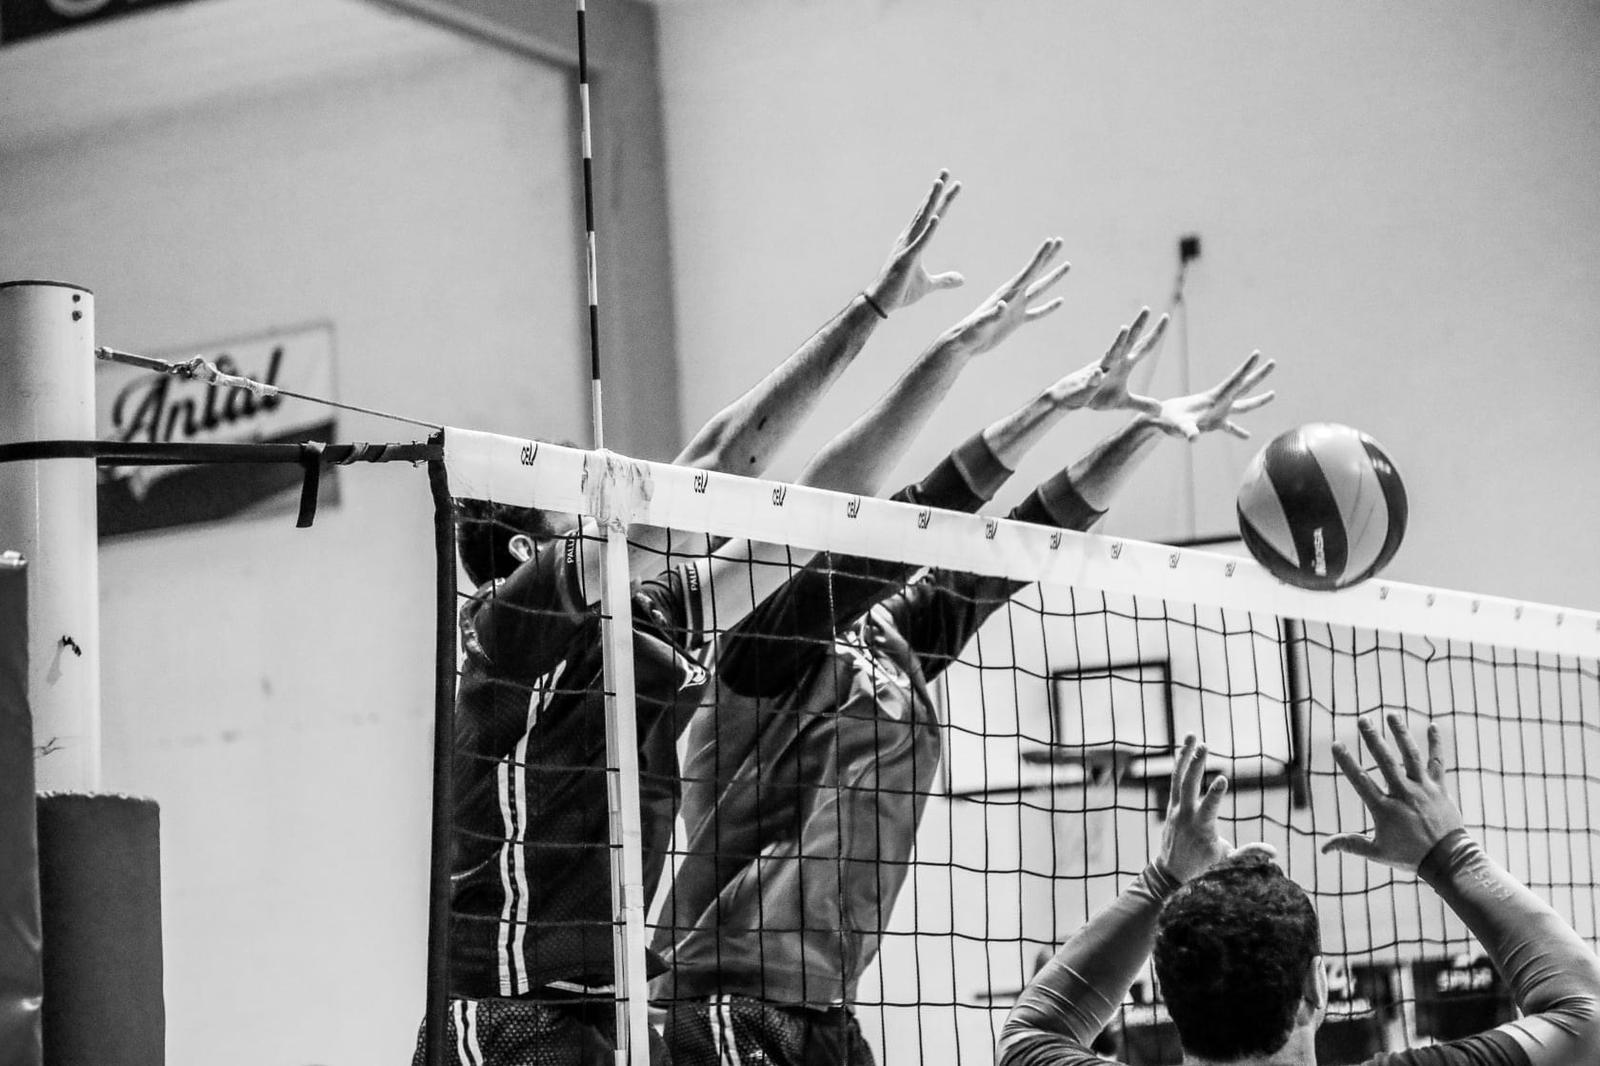 II match stagionale Querzoli S. volley Forlì- Geetit pallavolo Bologna